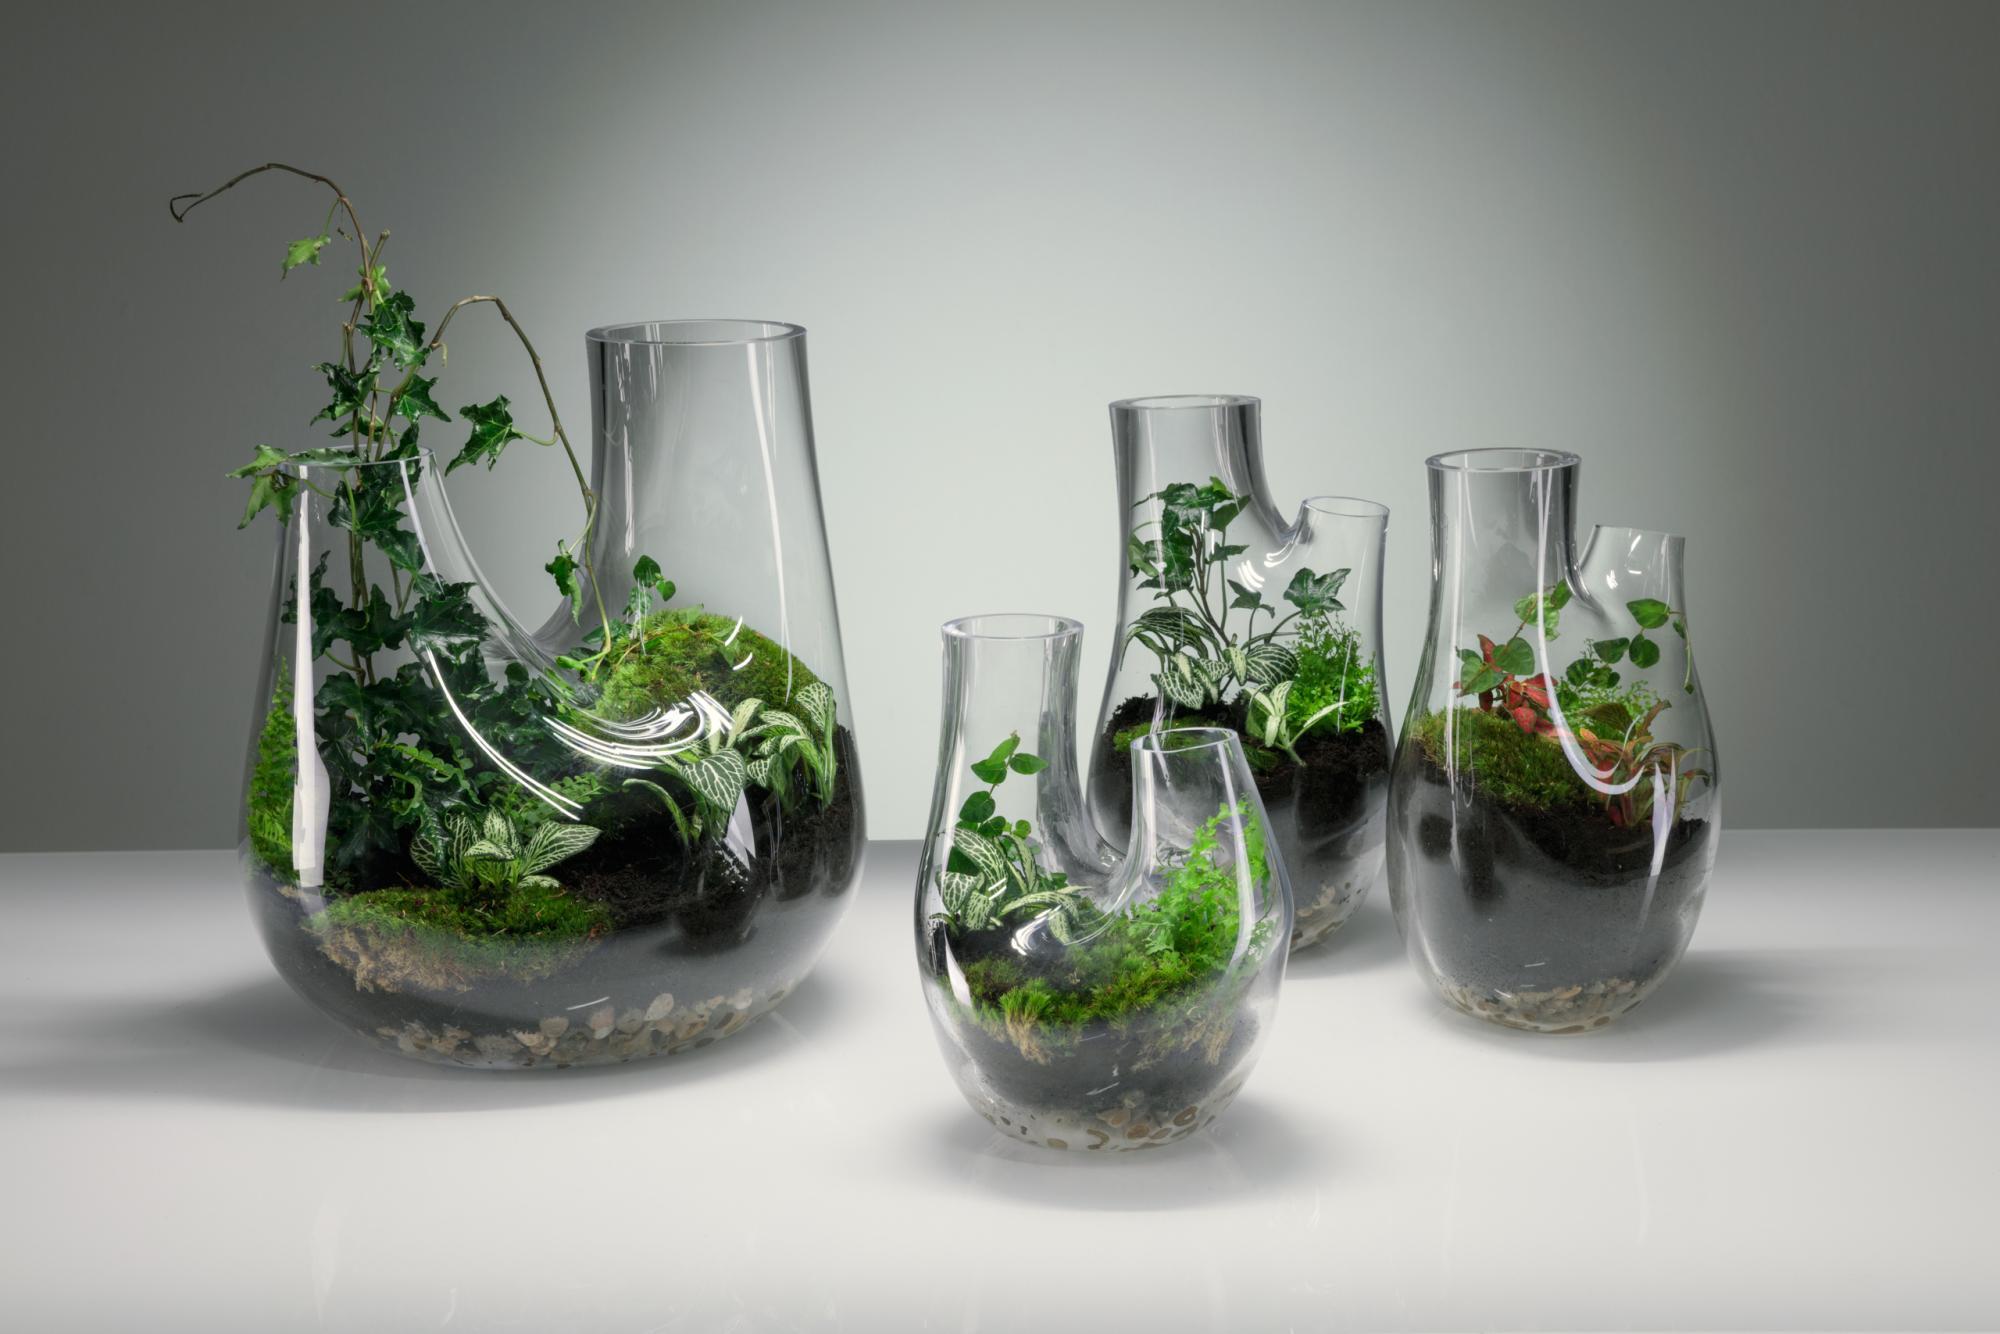 PflanzenTerrarium selber machen Schritt fr SchrittAnleitung